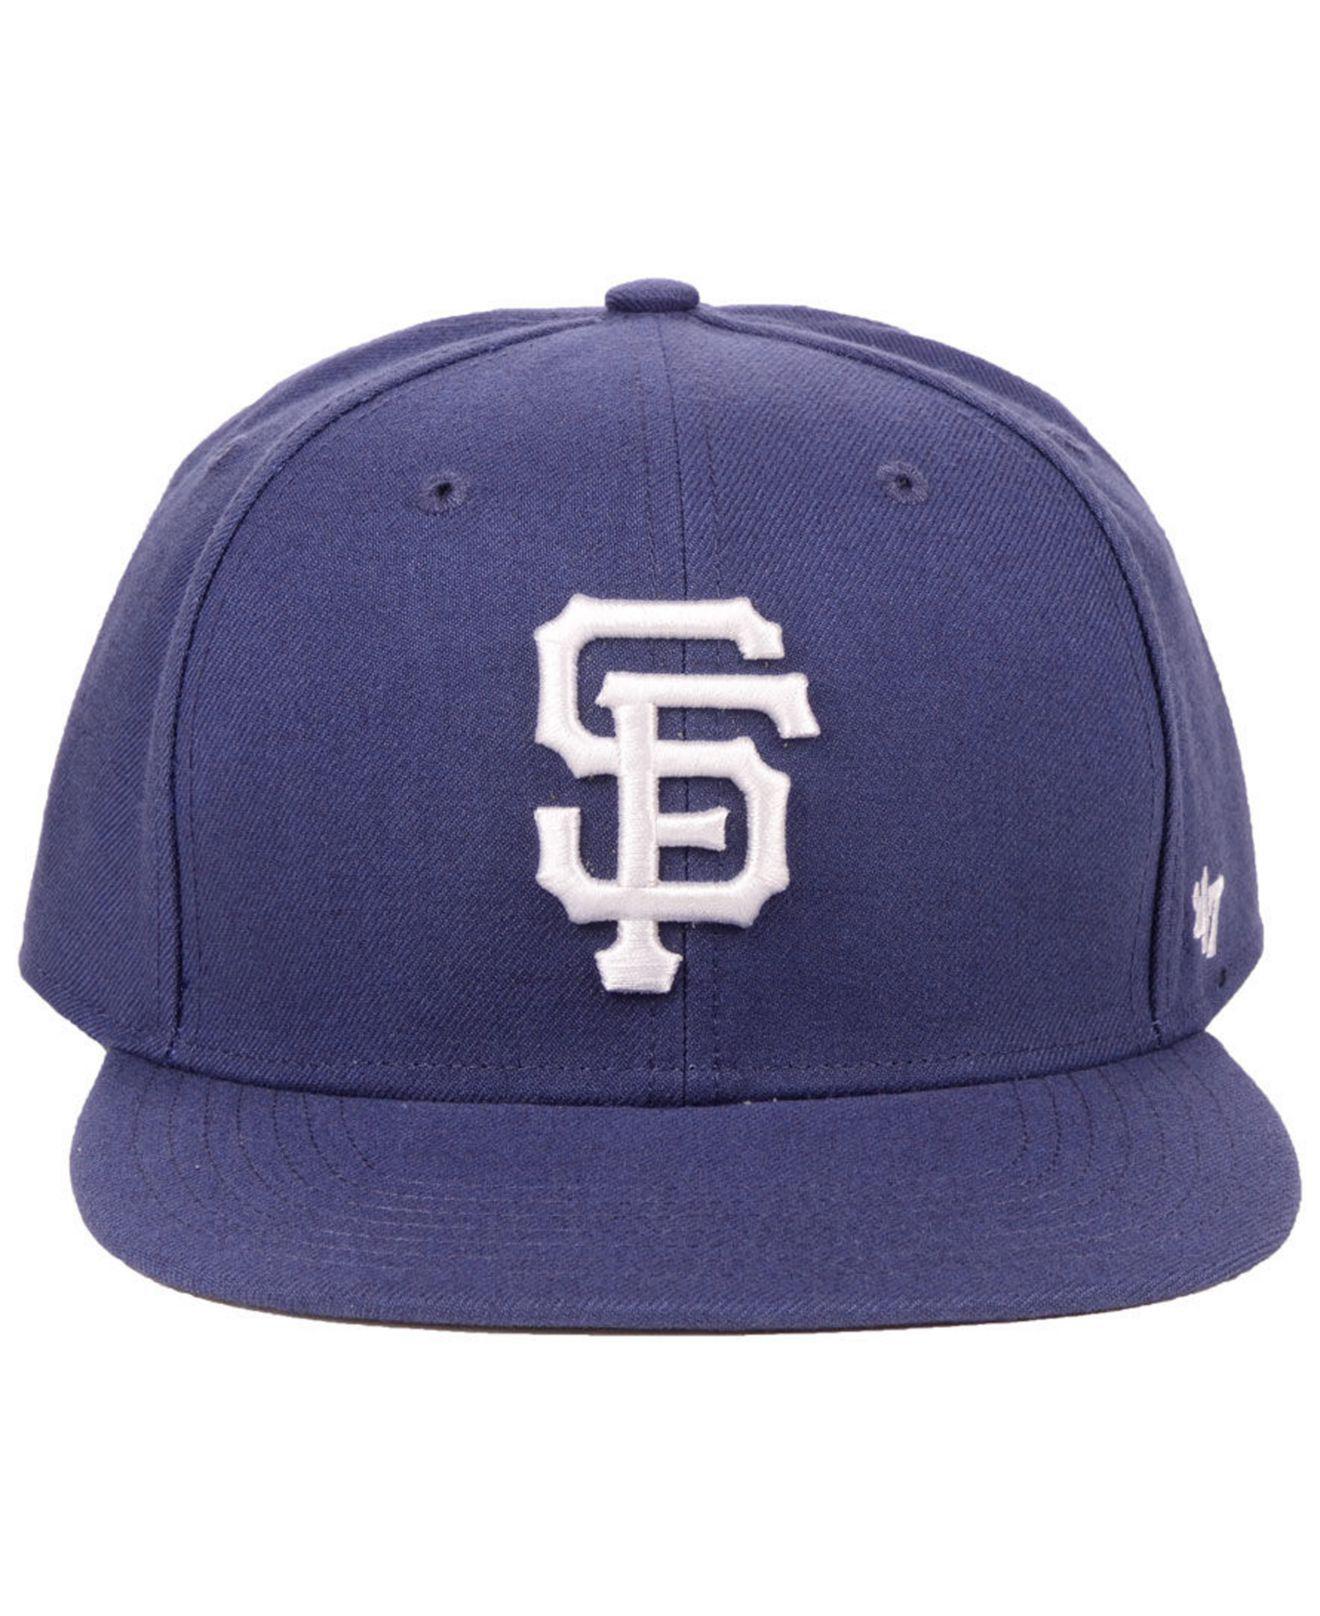 778d06ac68a Lyst - 47 Brand San Francisco Giants Autumn Snapback Cap in Blue for Men